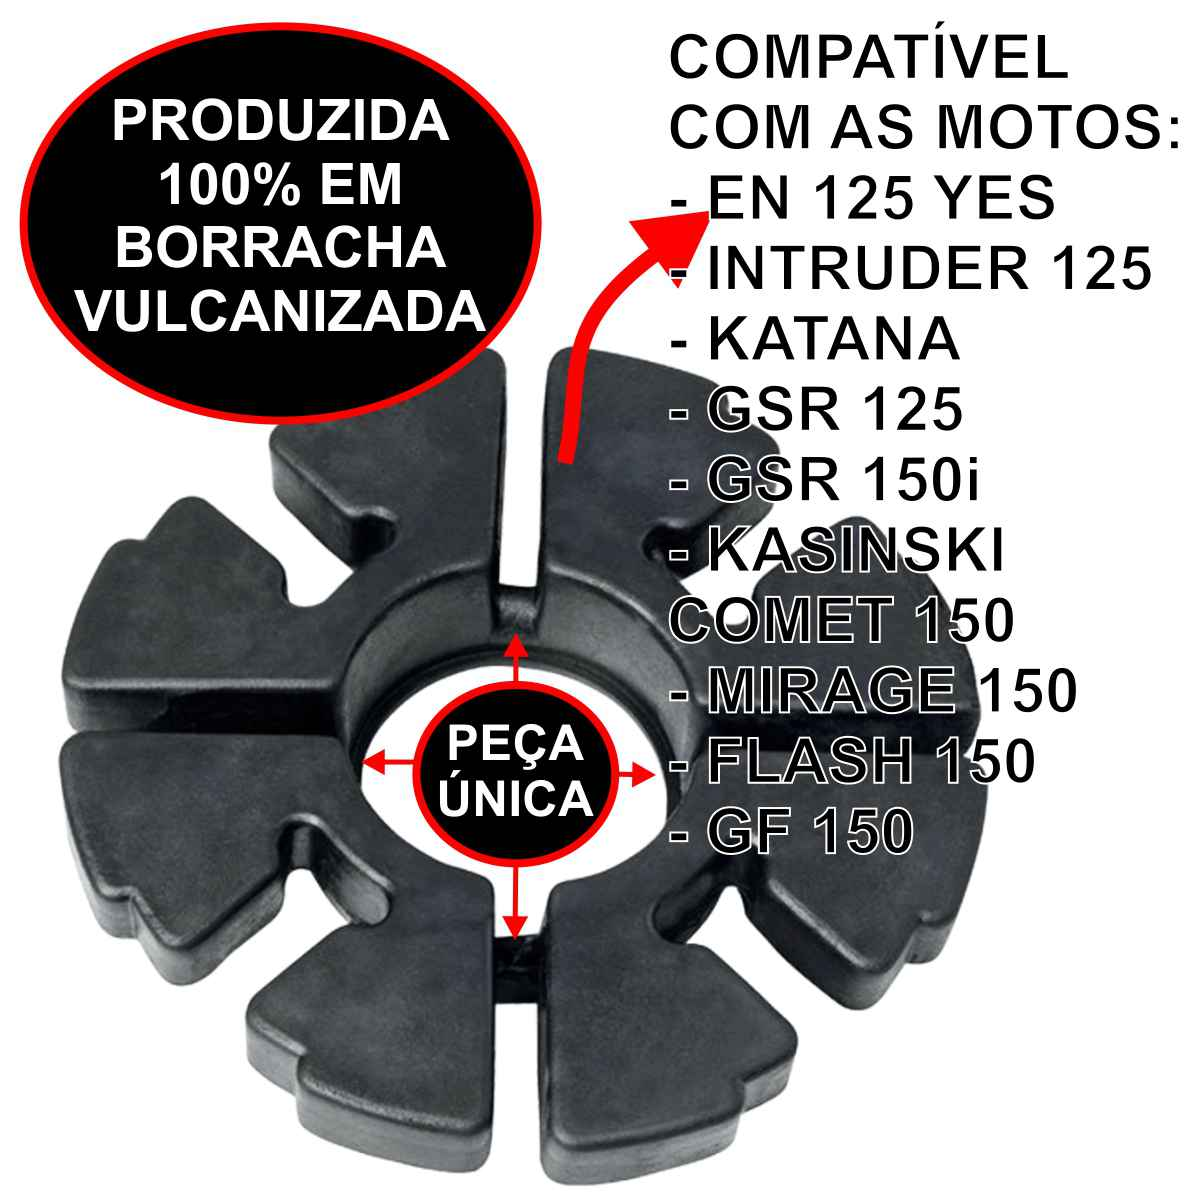 KIT COXIM BORRACHA BUCHA COROA RODA SUZUKI EN 125 YES INTRUDER KATANA COMET 150 + GRAXA SPRAY 60ml